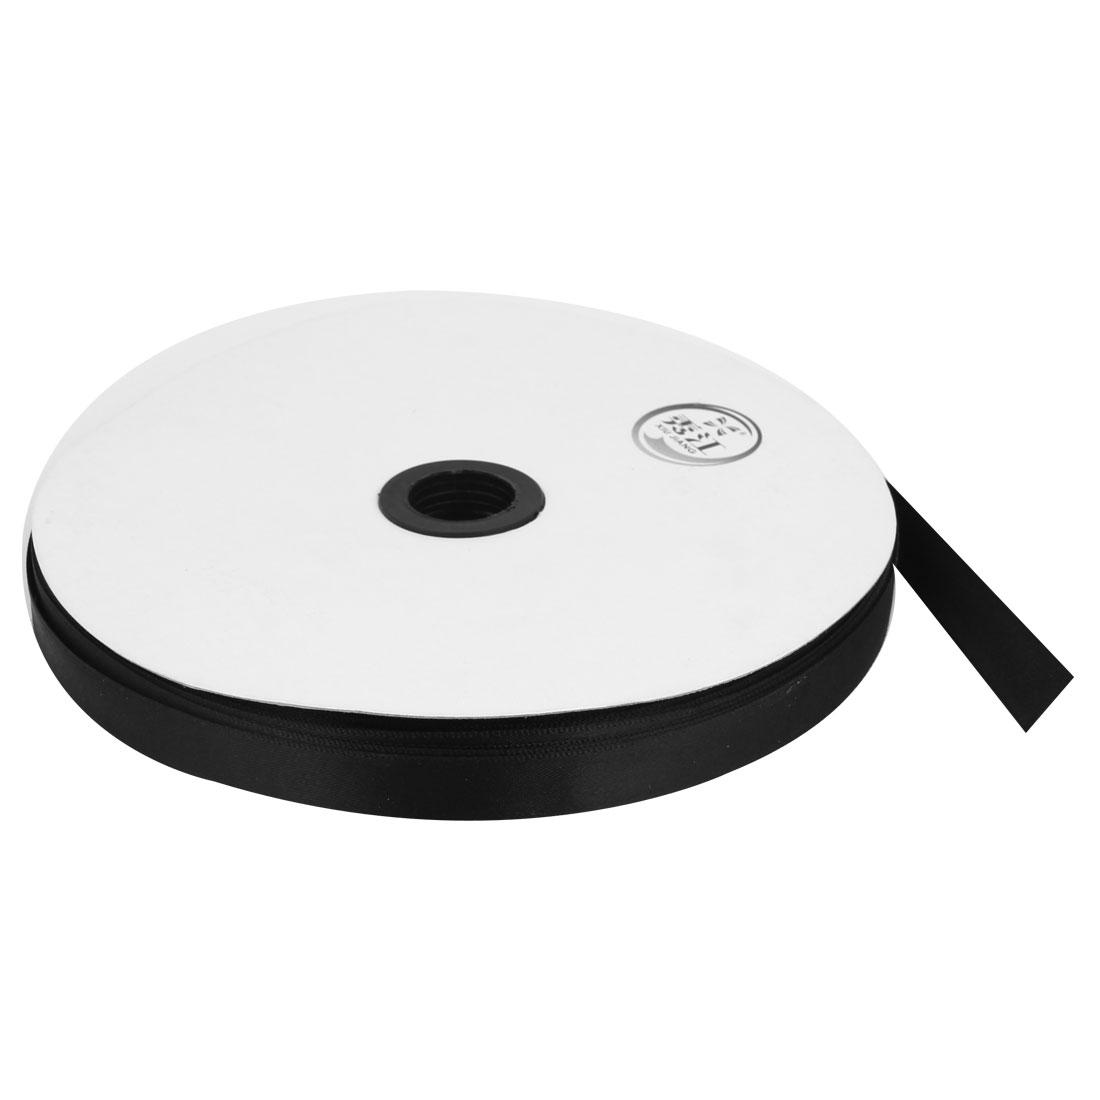 Black 1.3cm Width DIY Craft Wedding Party Sewing Decor Ribbon Roll Tape 100 Yard 91m Length